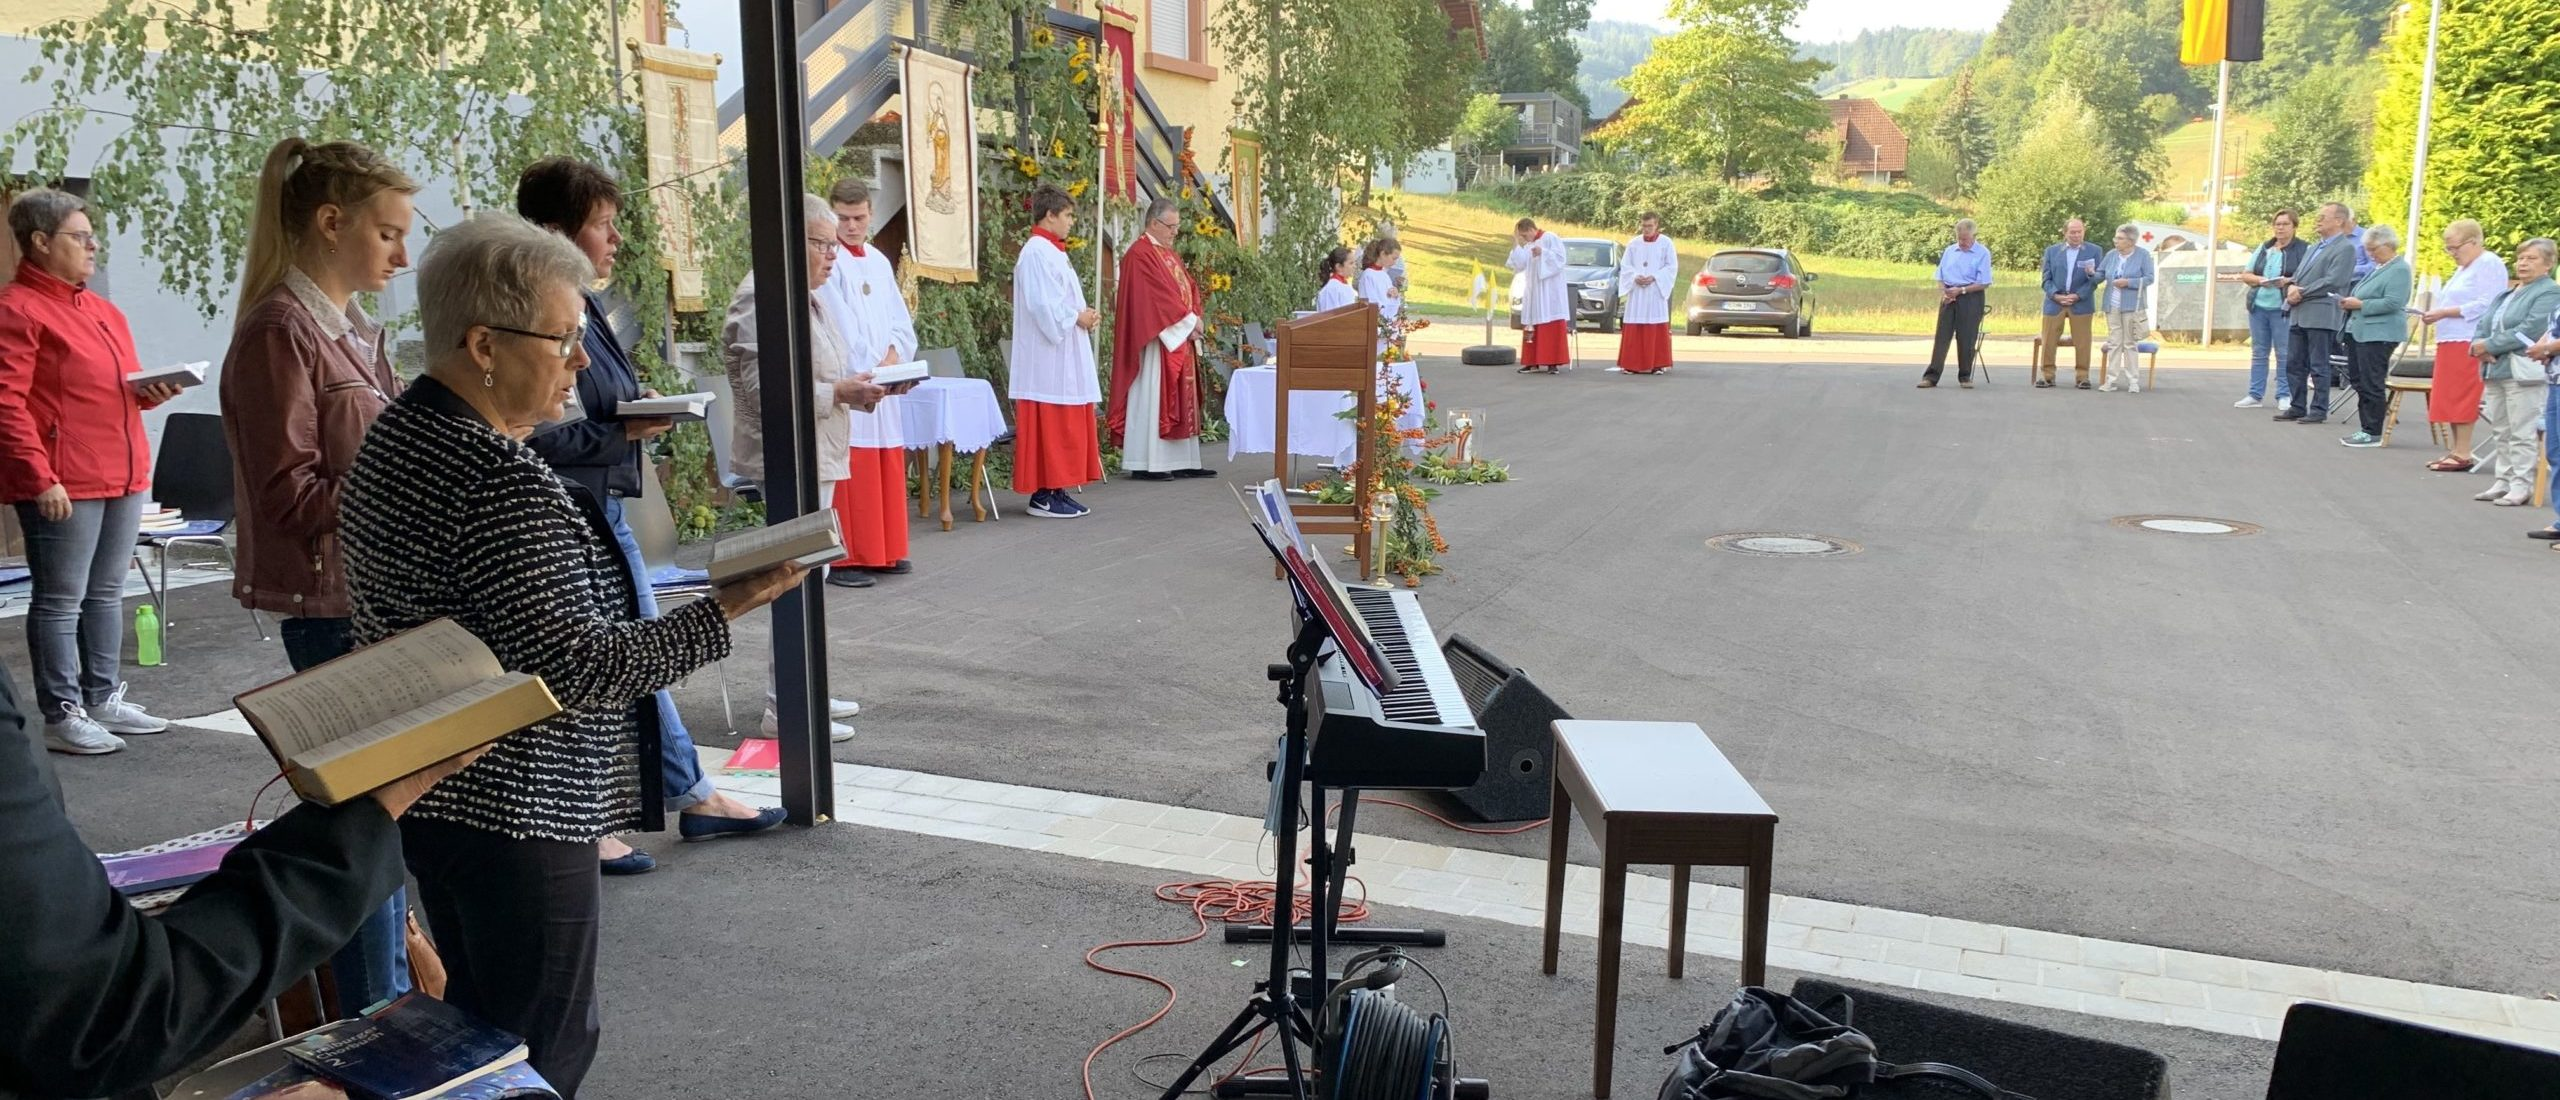 Prinzbach feiert Patrozinium von St. Mauritius